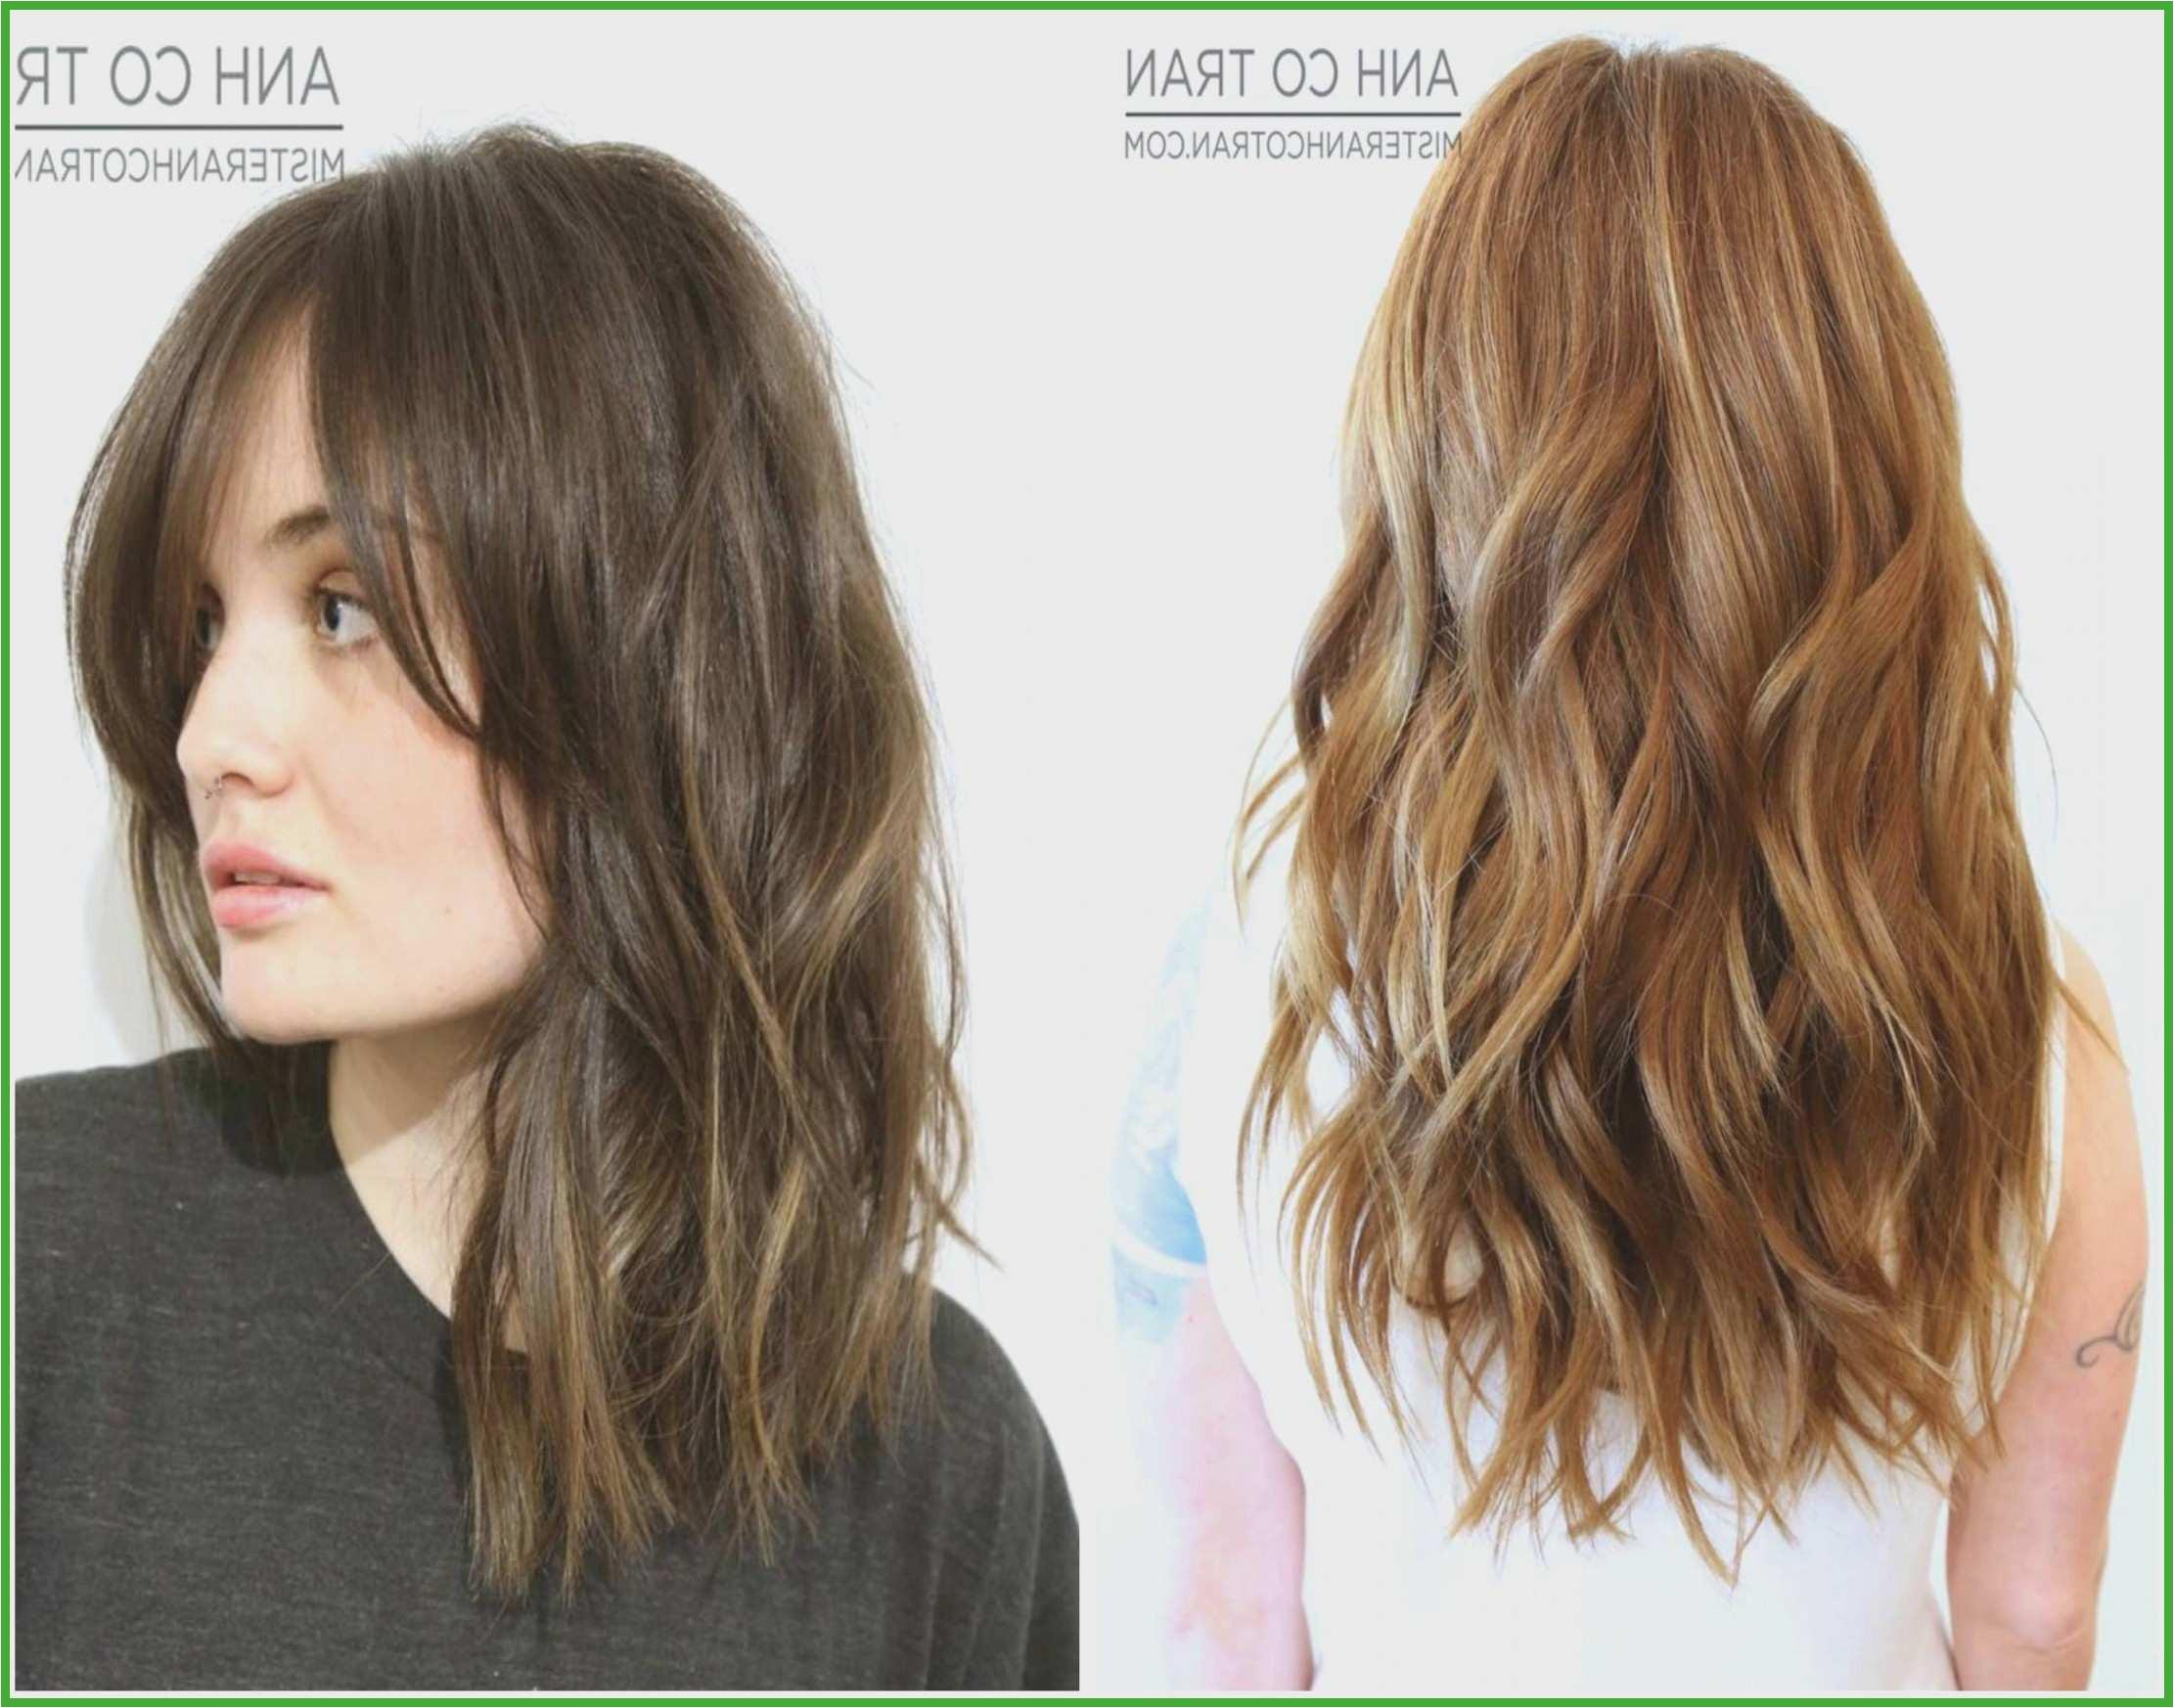 Asian Highlight Hair Fresh Medium Curled Hair Very Curly Hairstyles Fresh Curly Hair 0d